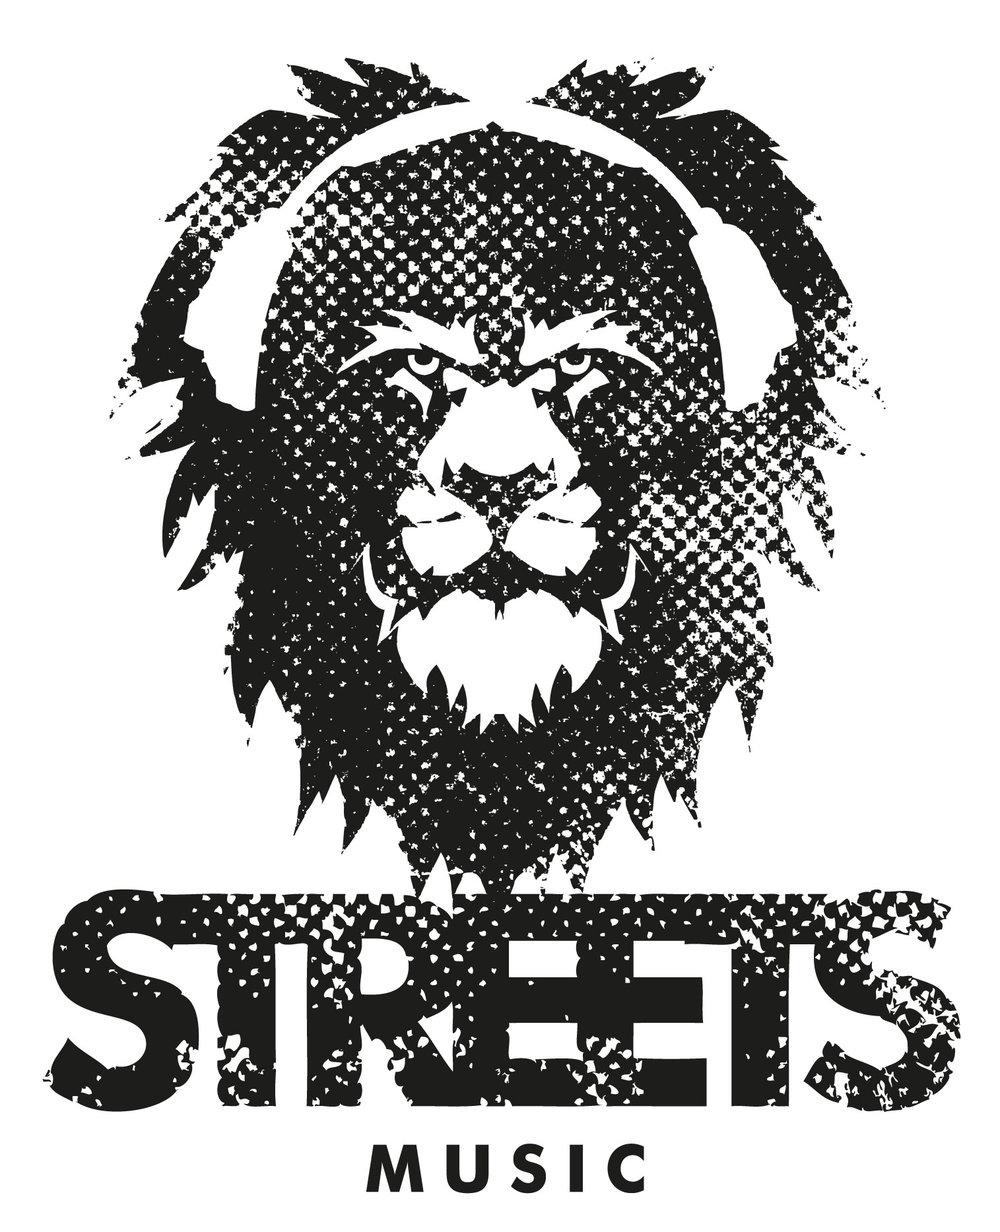 streets-music-logo-black.jpg